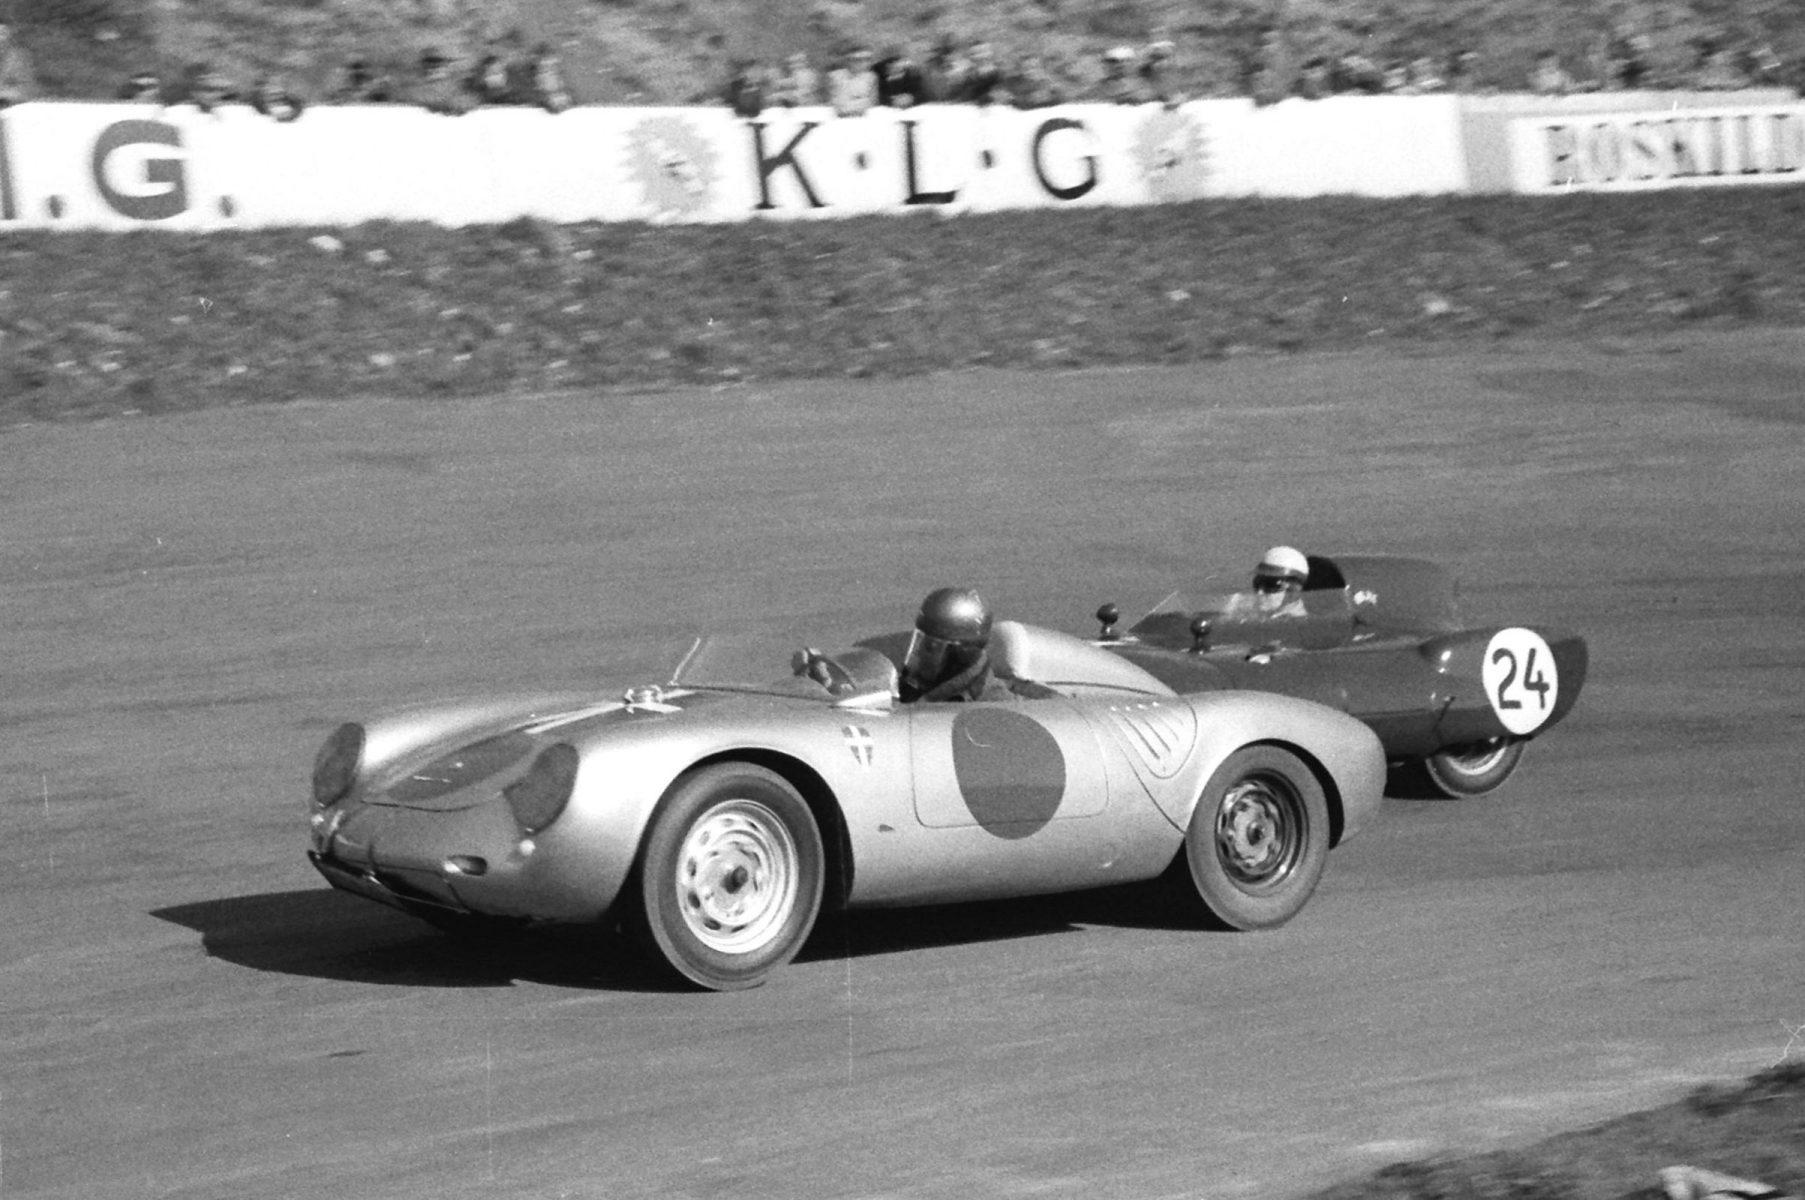 porscge 550 julius voigt nielsen fights gordon jones and his lotus 11 for the lead at roskilde denmark in april of 1957.jpg